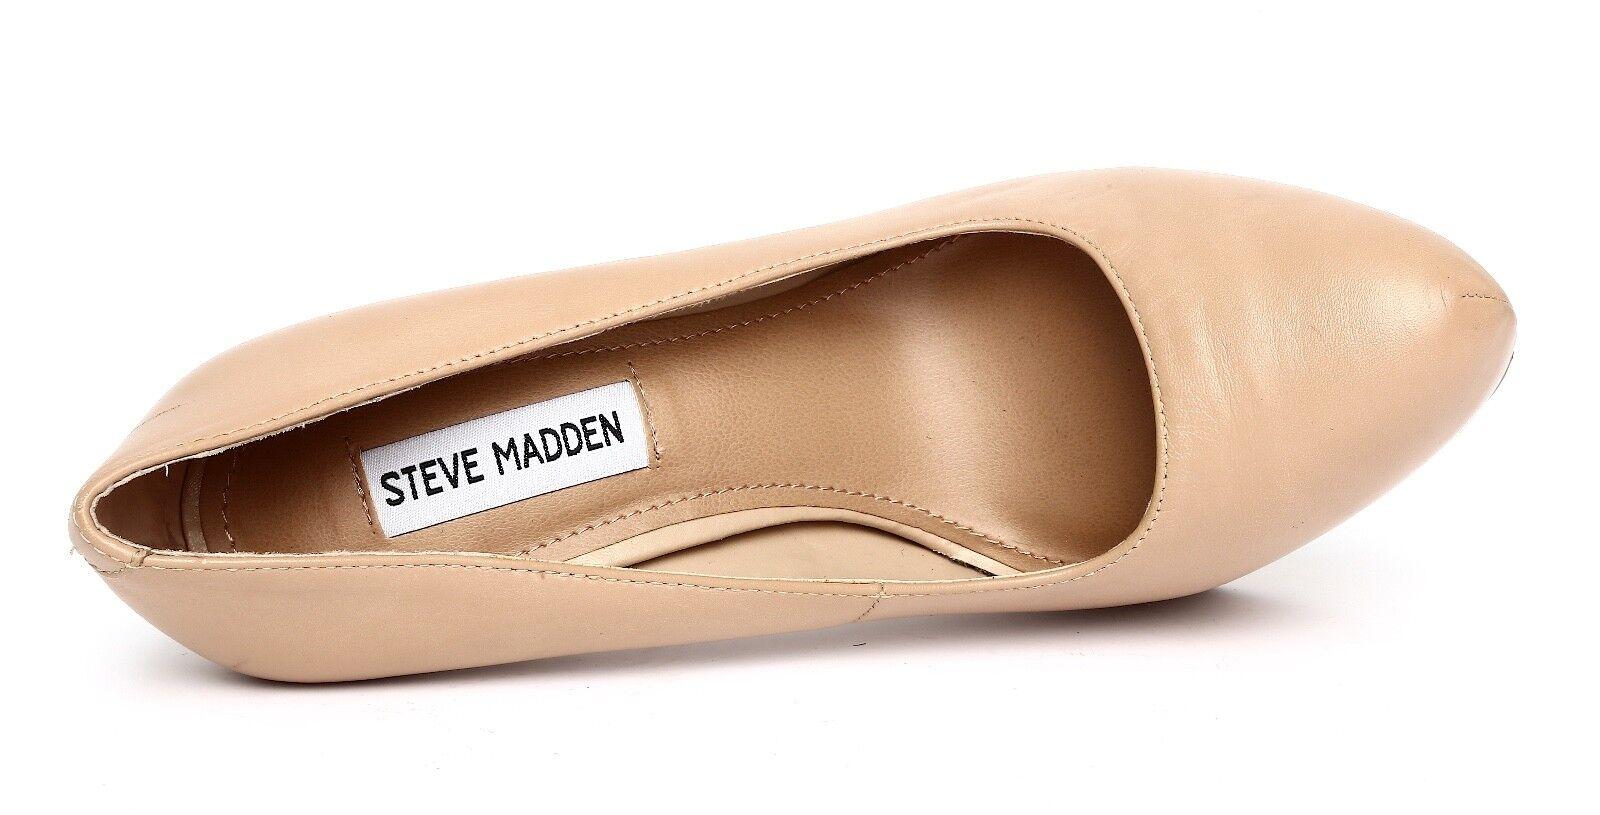 Steve Steve Steve Madden Delerius Beige Platform High Heel Pumps Sz 8 3138 ecd695